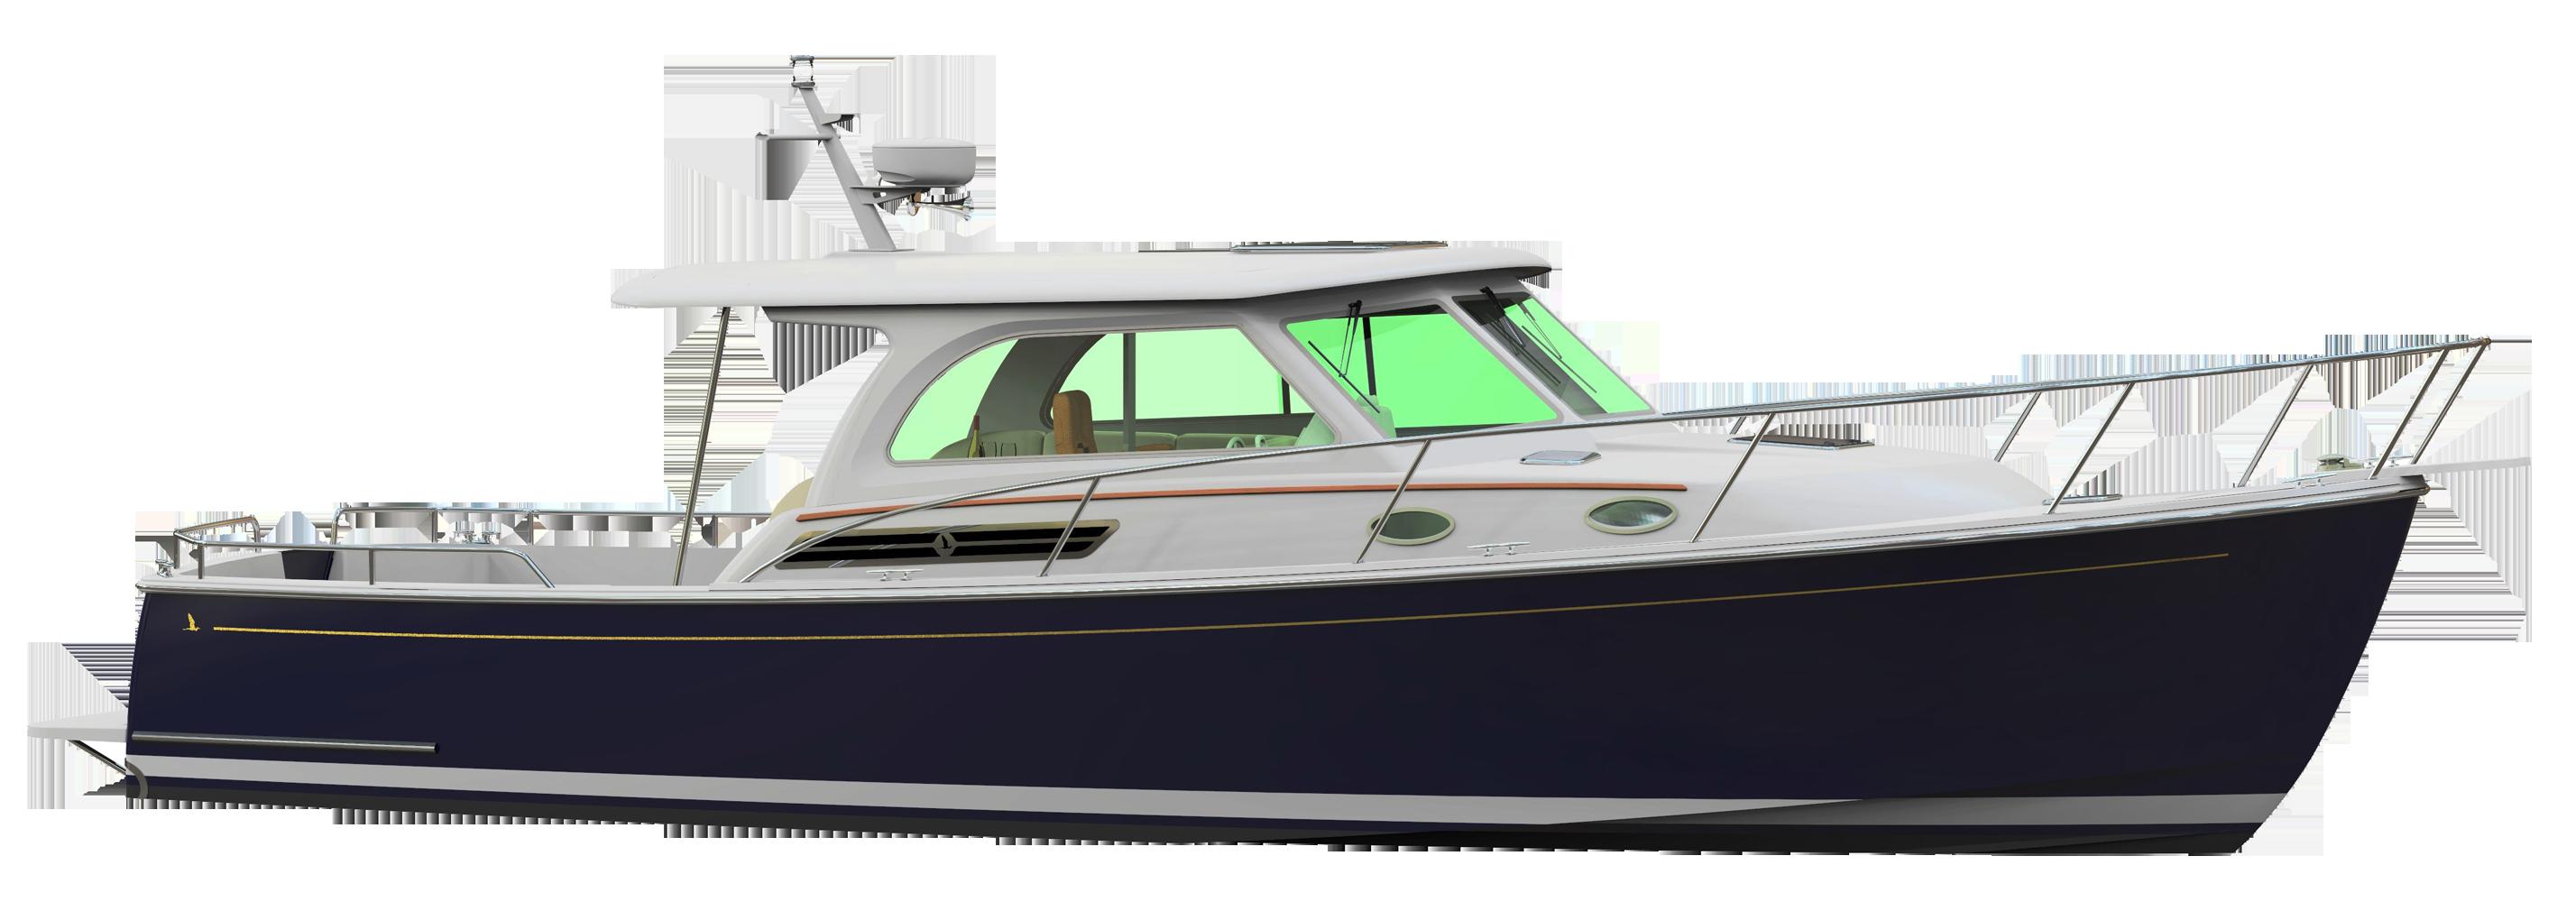 Yacht and Boat Surveyors SAMS® - Stuart, Jupiter, Palm Beaches FL